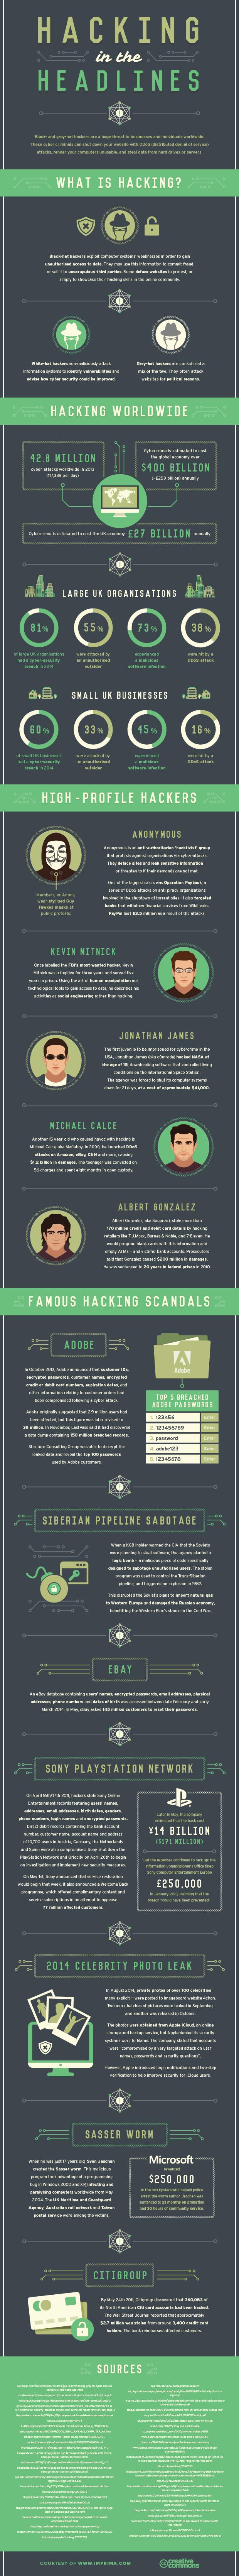 Hacking -Headlines